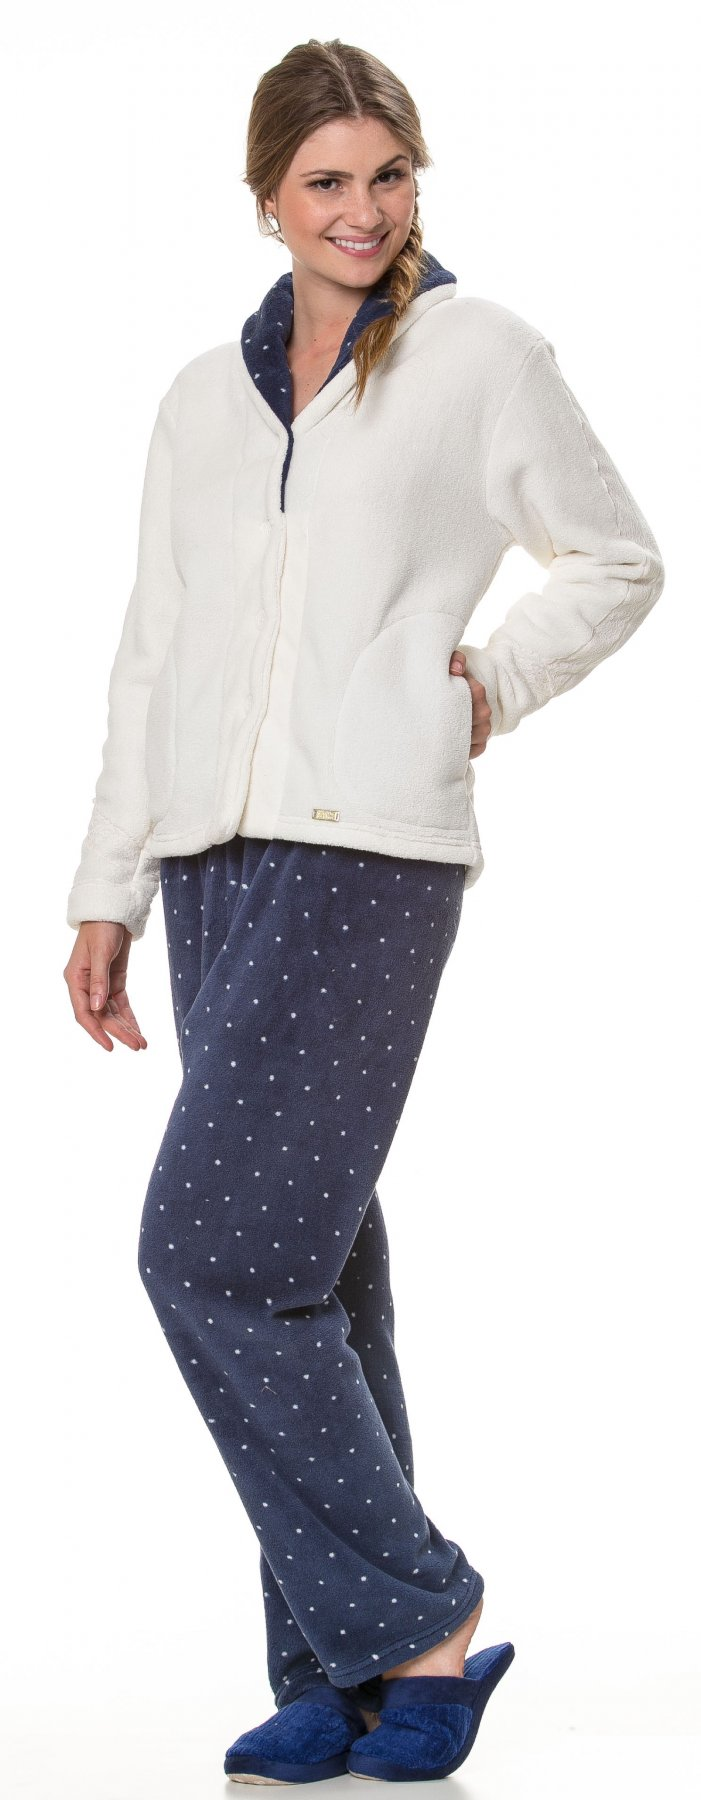 Pijama Soft Elegance Promoção